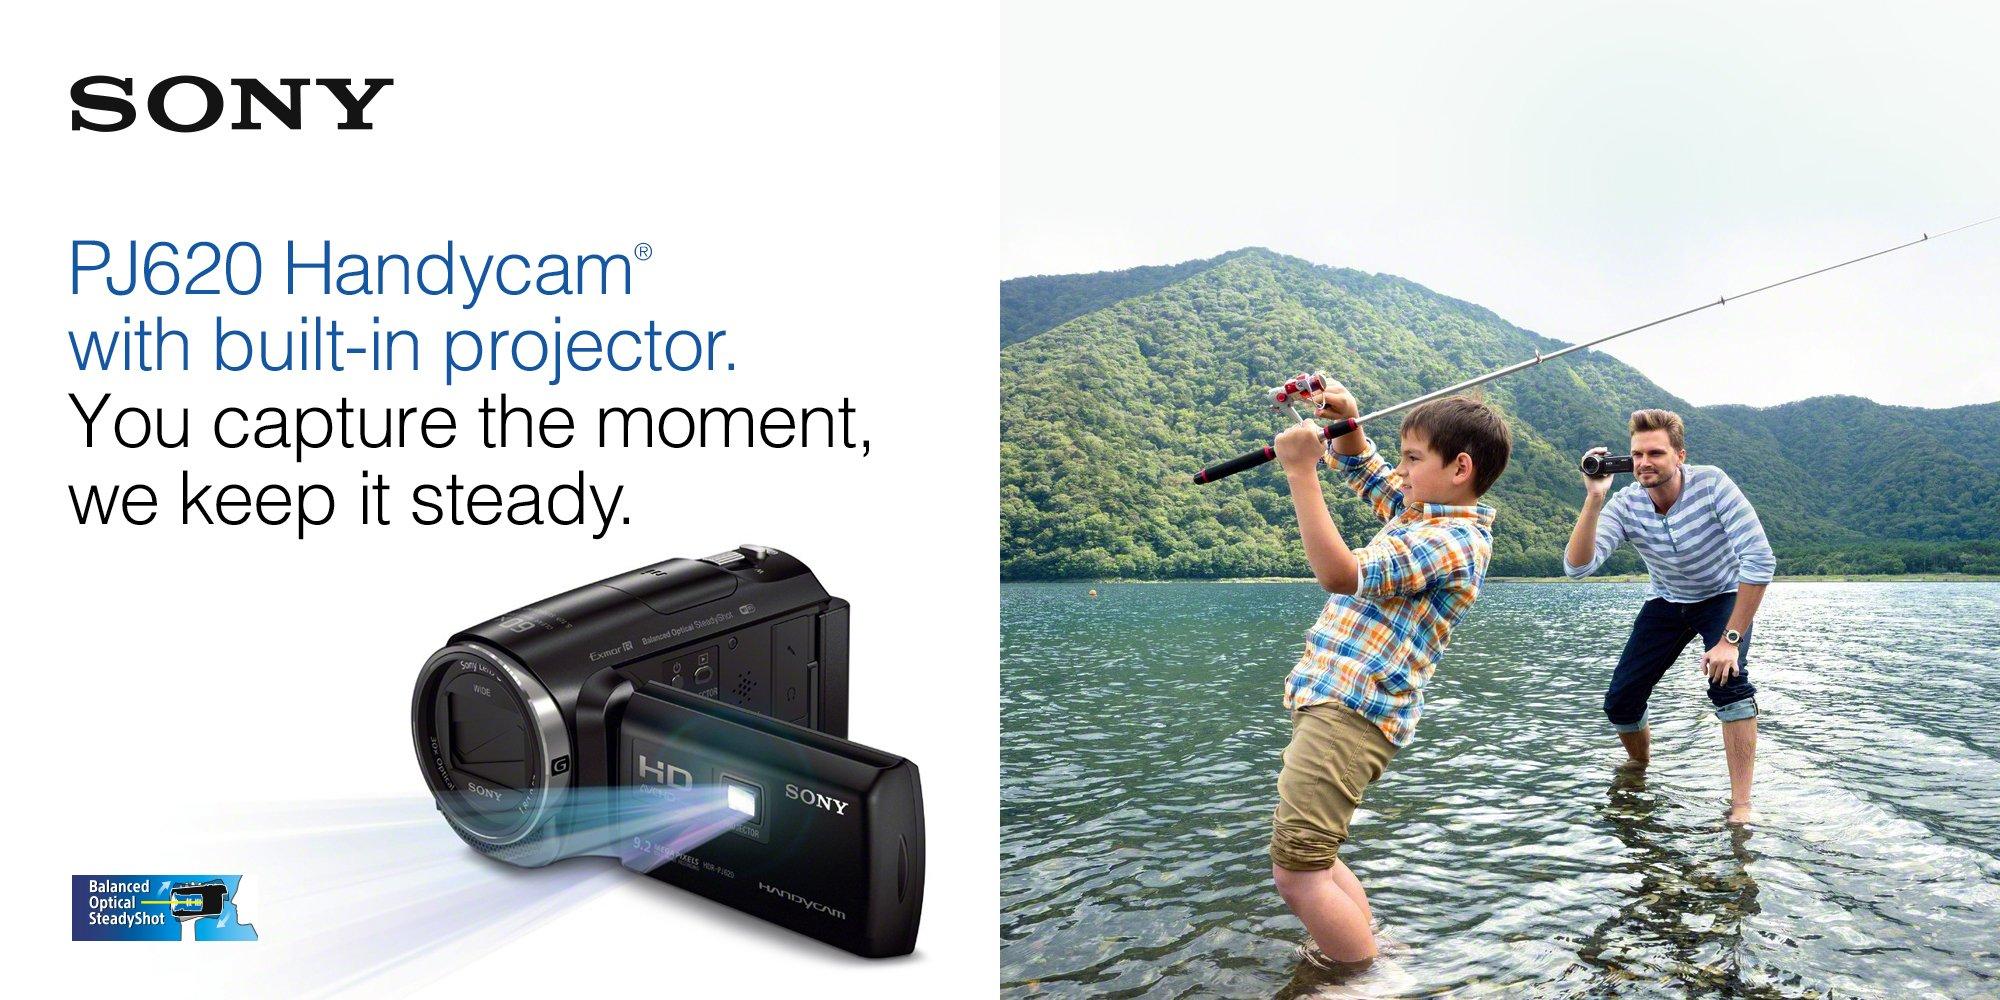 Sony Pj620 camcorder